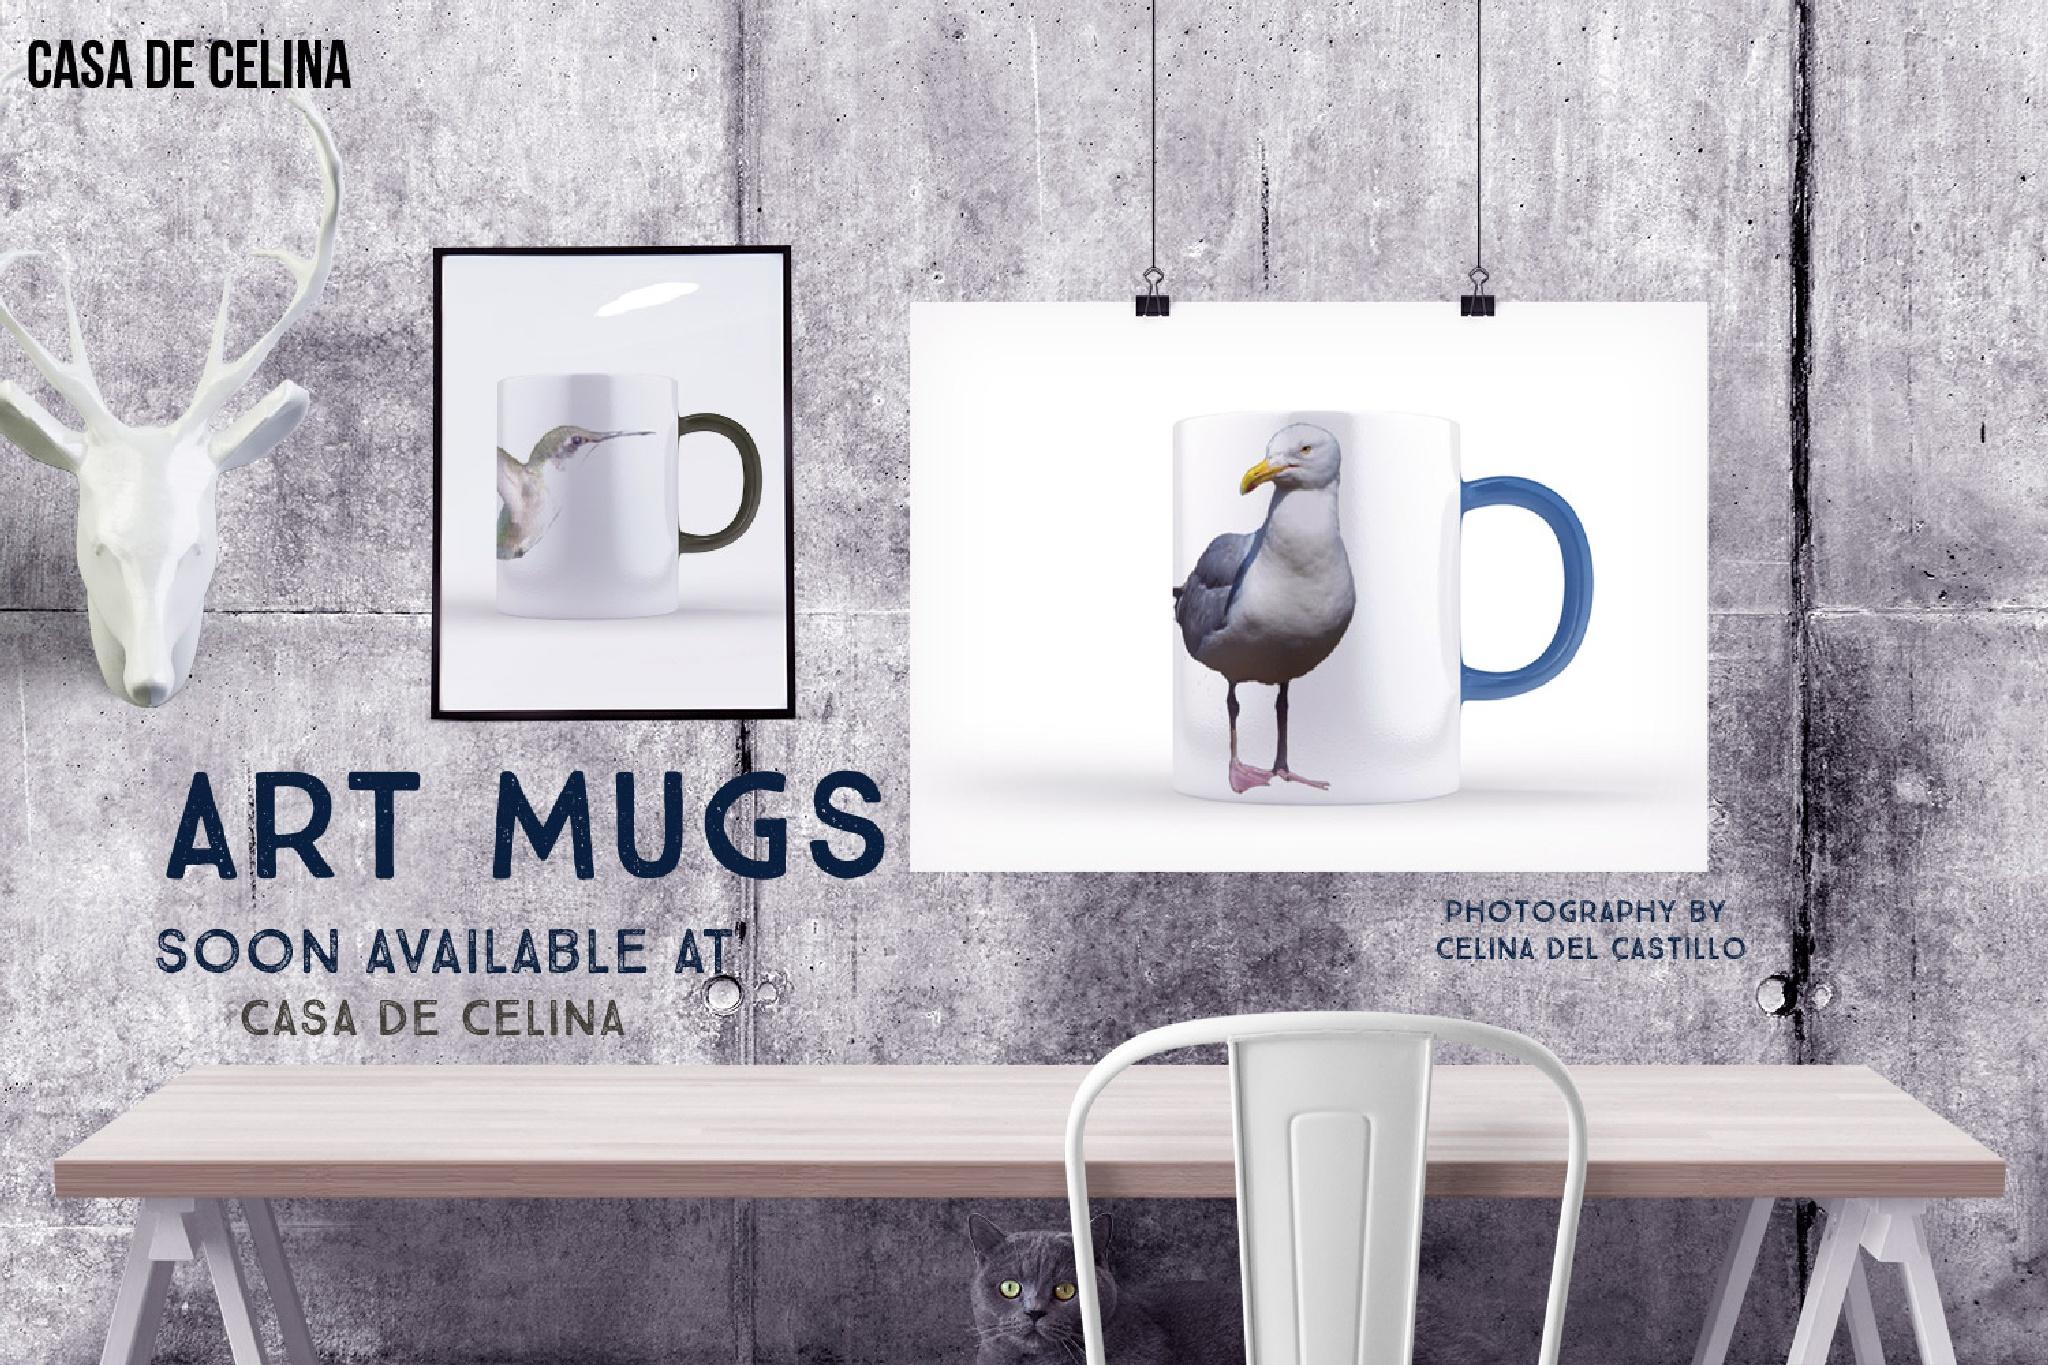 Mug design by Celina del Castillo by Celina del Castillo